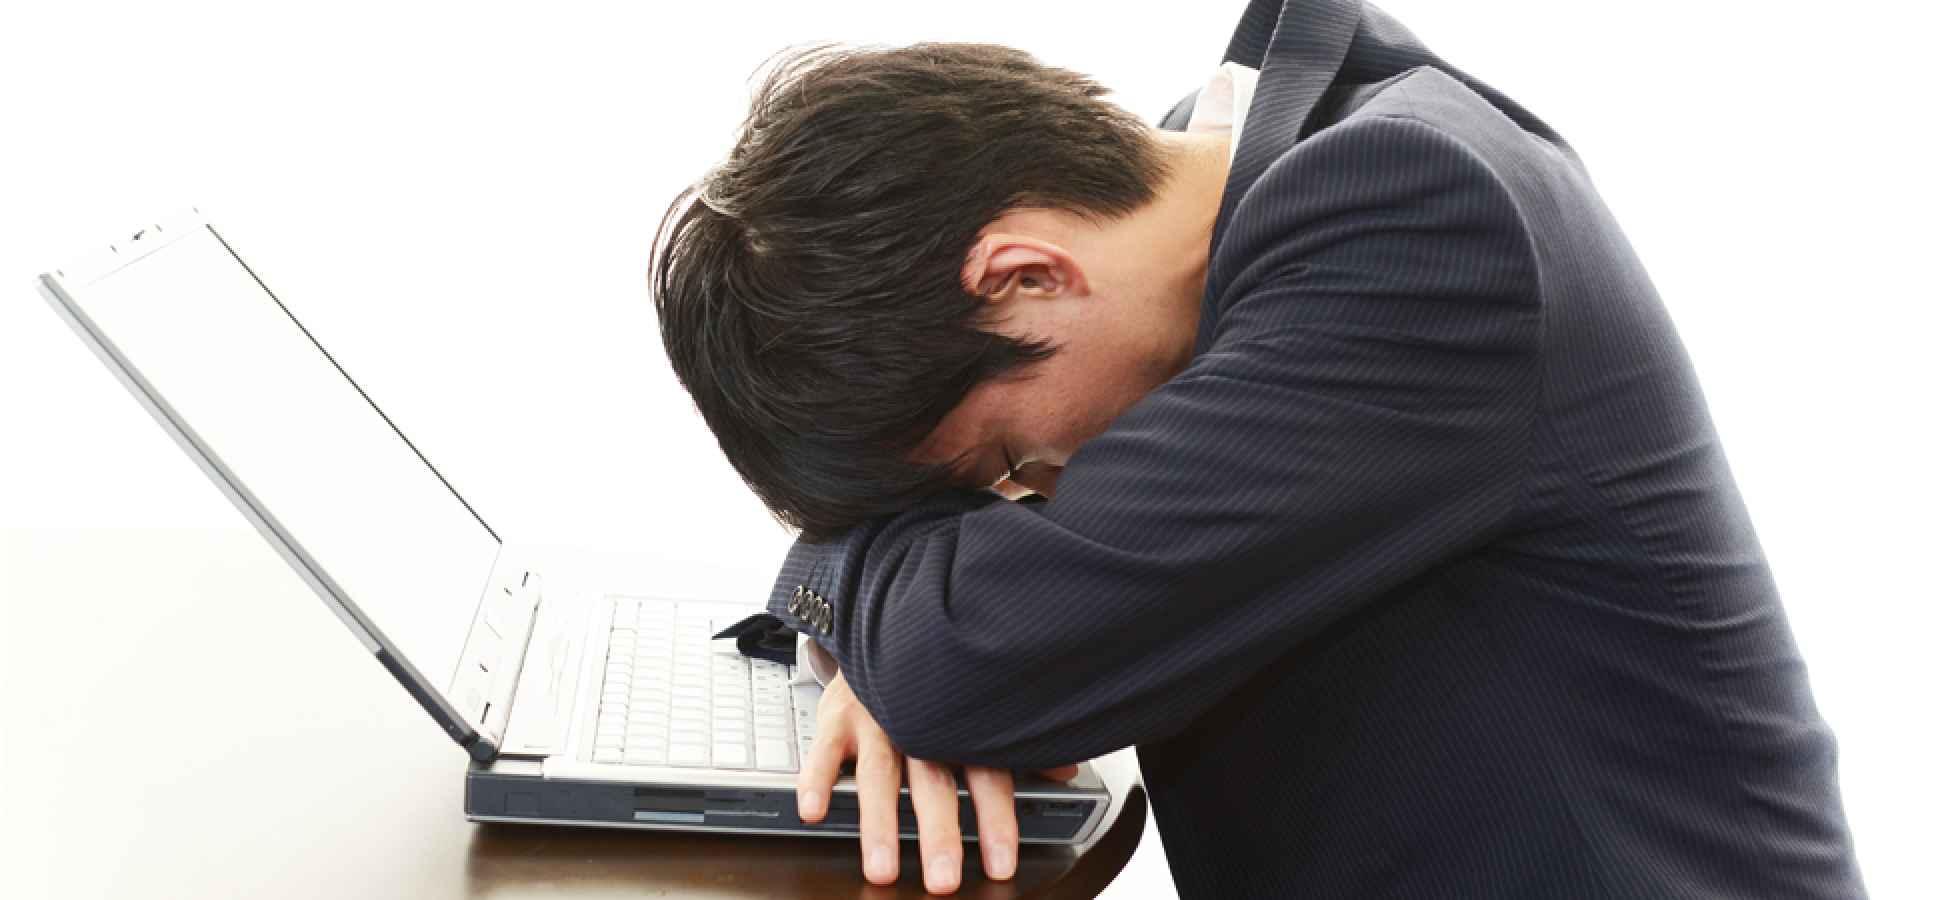 4 Social Media Personal Branding Mistakes You Must Avoid